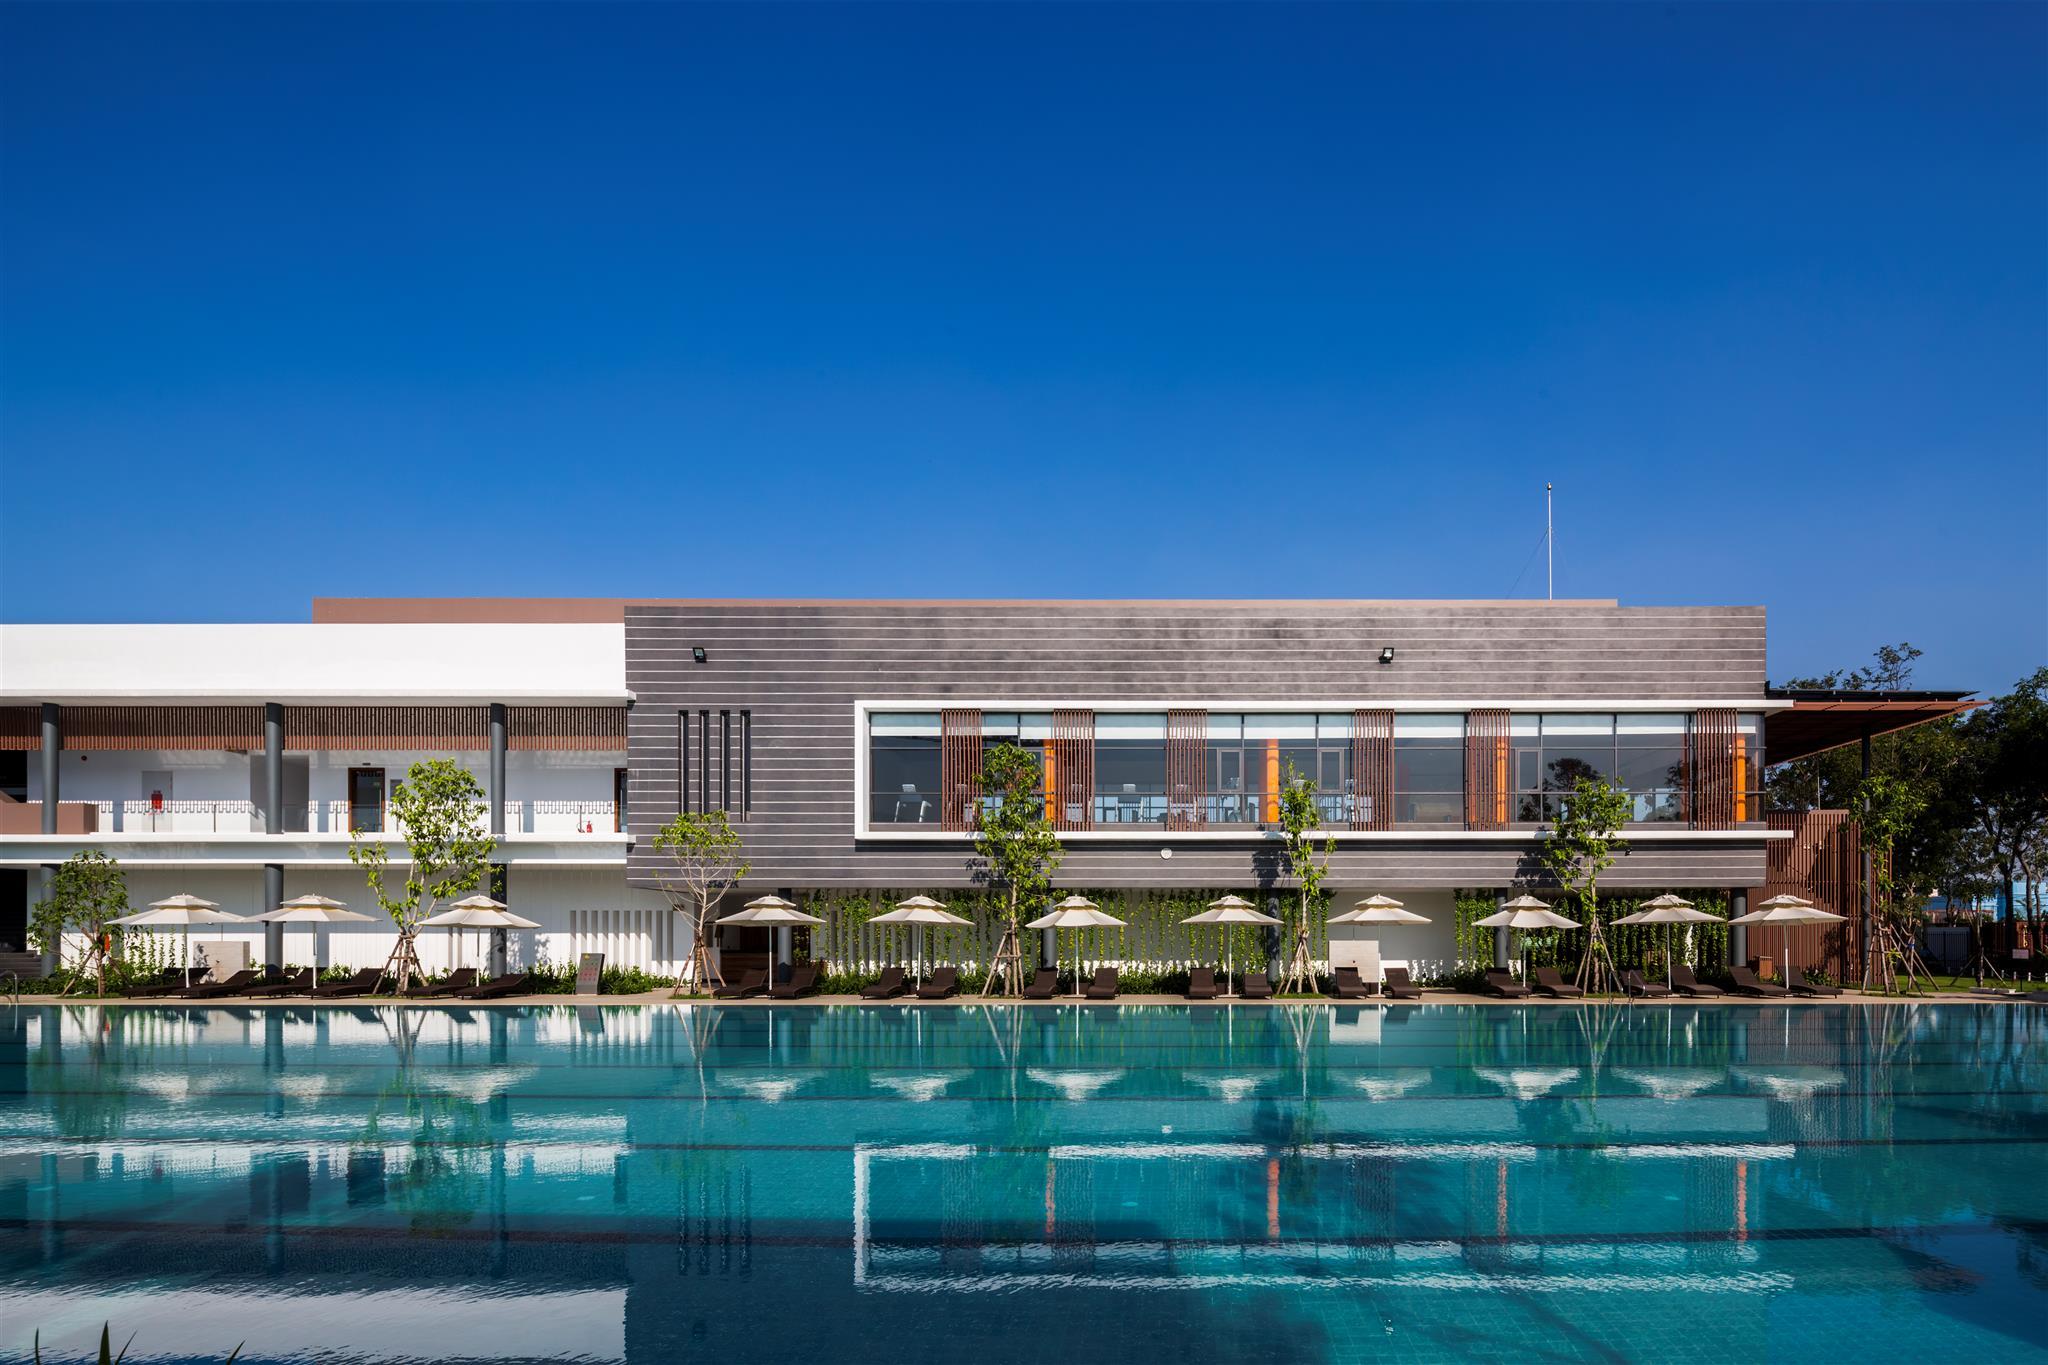 Hồ bơi lớn tiêu chuẩn Olympic - Celadon Sports & Resort Club